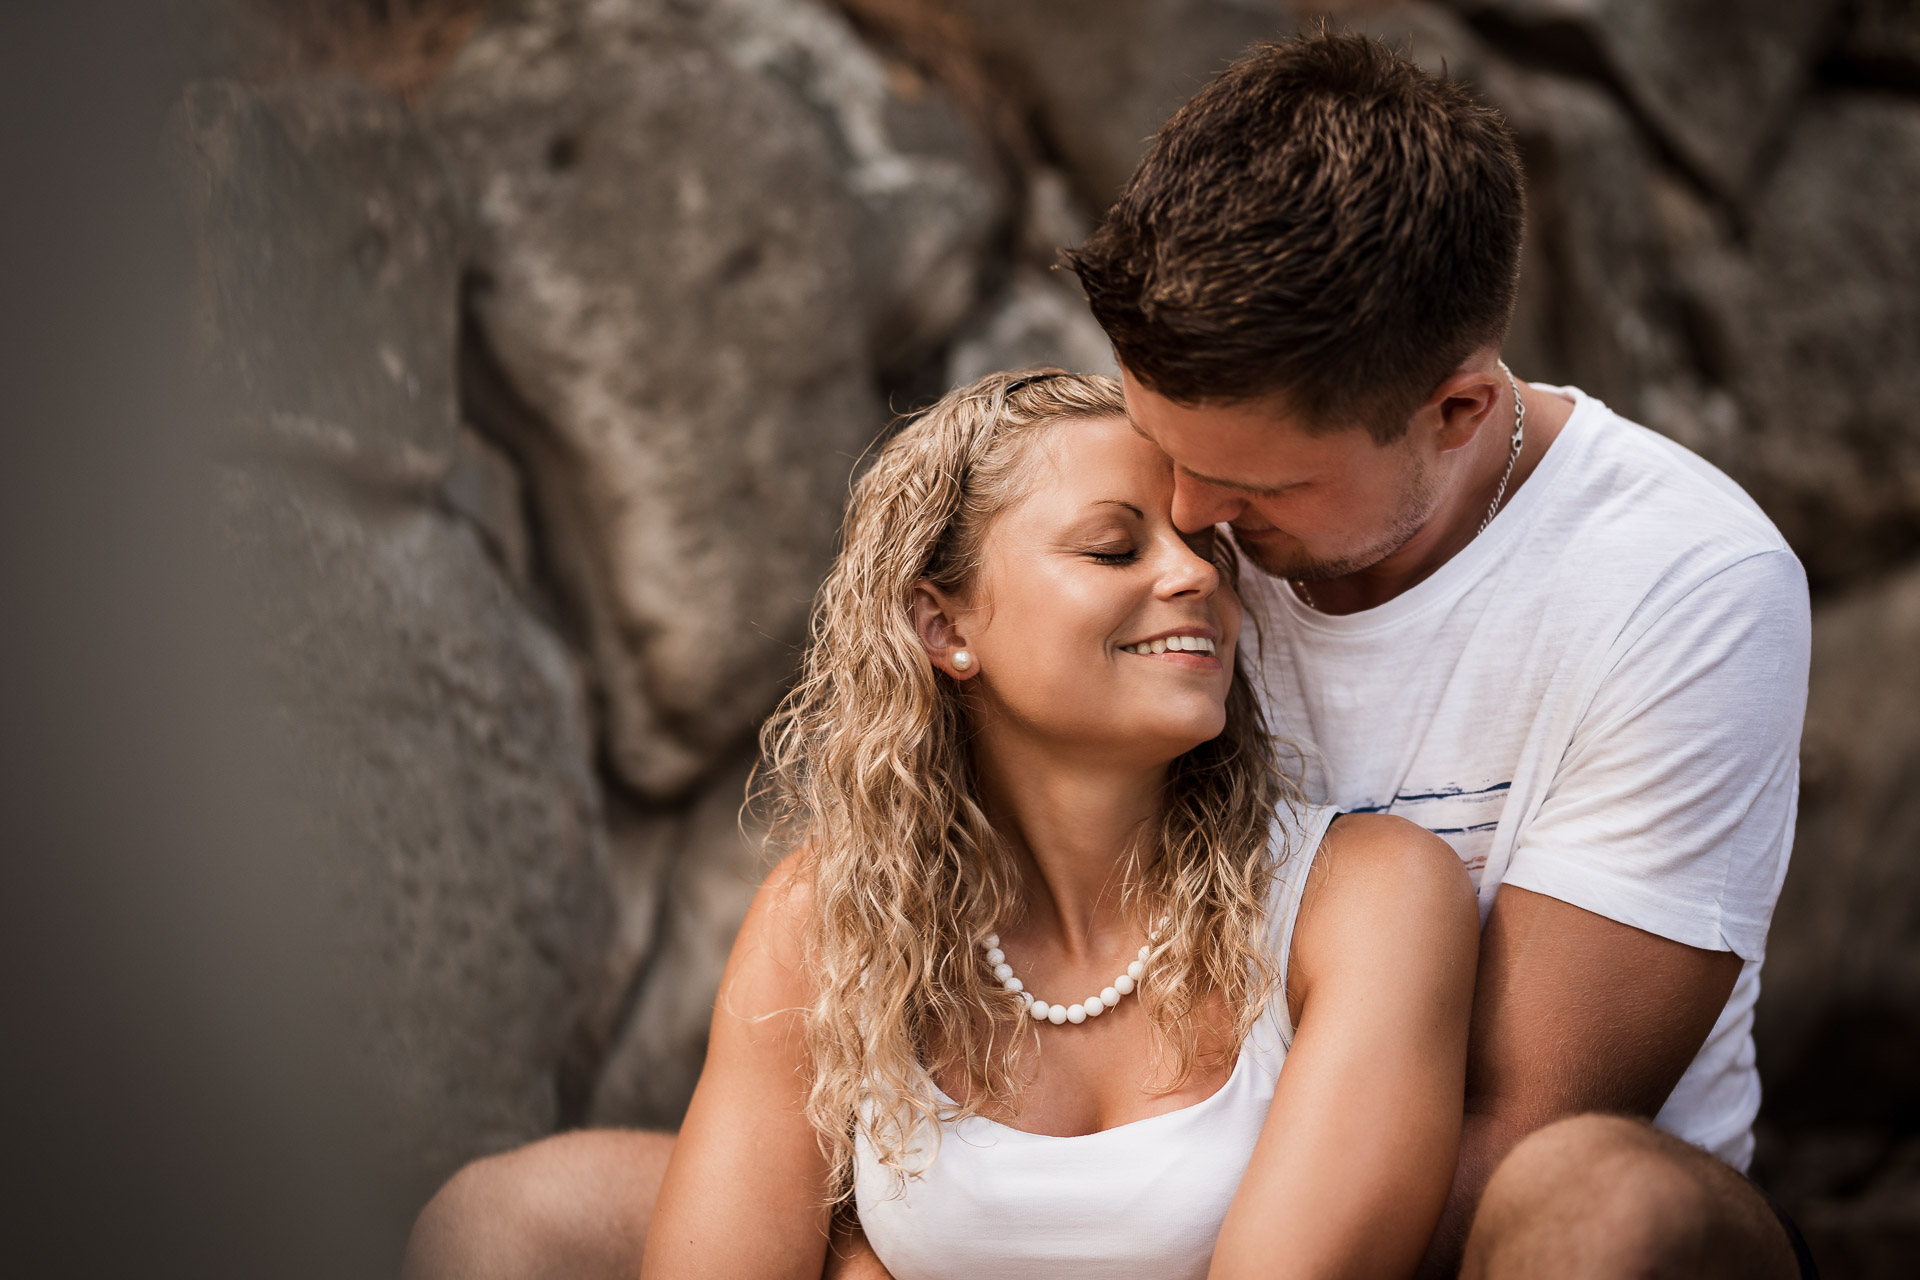 Vicky & Fabian, Paarshooting, Insel Rab, Kroatien